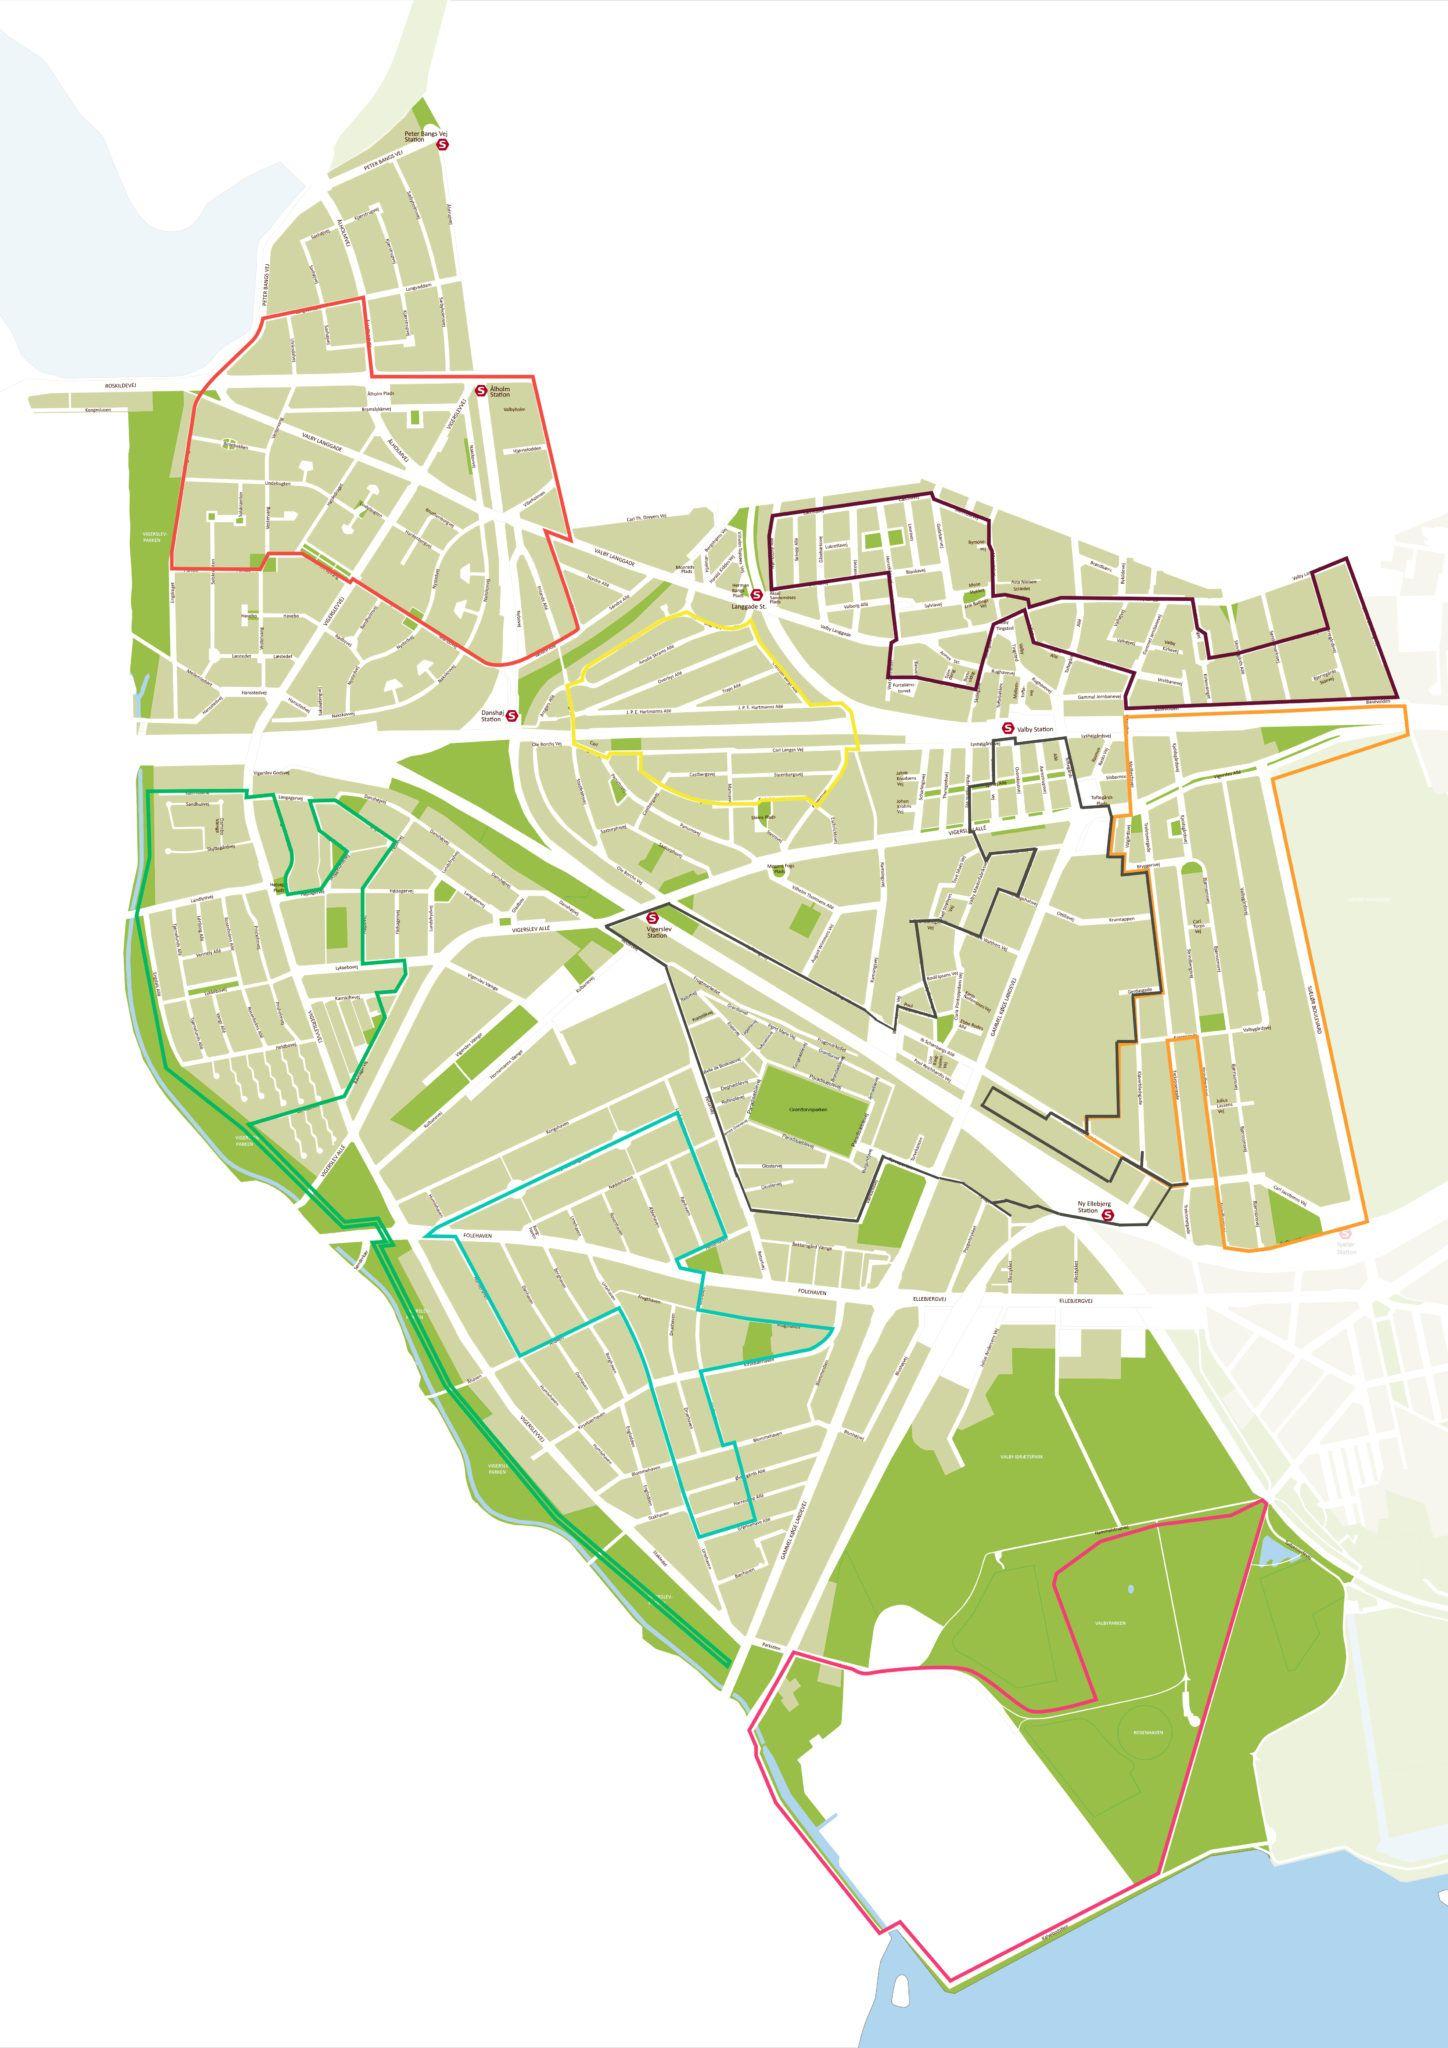 Nyt kort til Valbyruter med ruter 2021